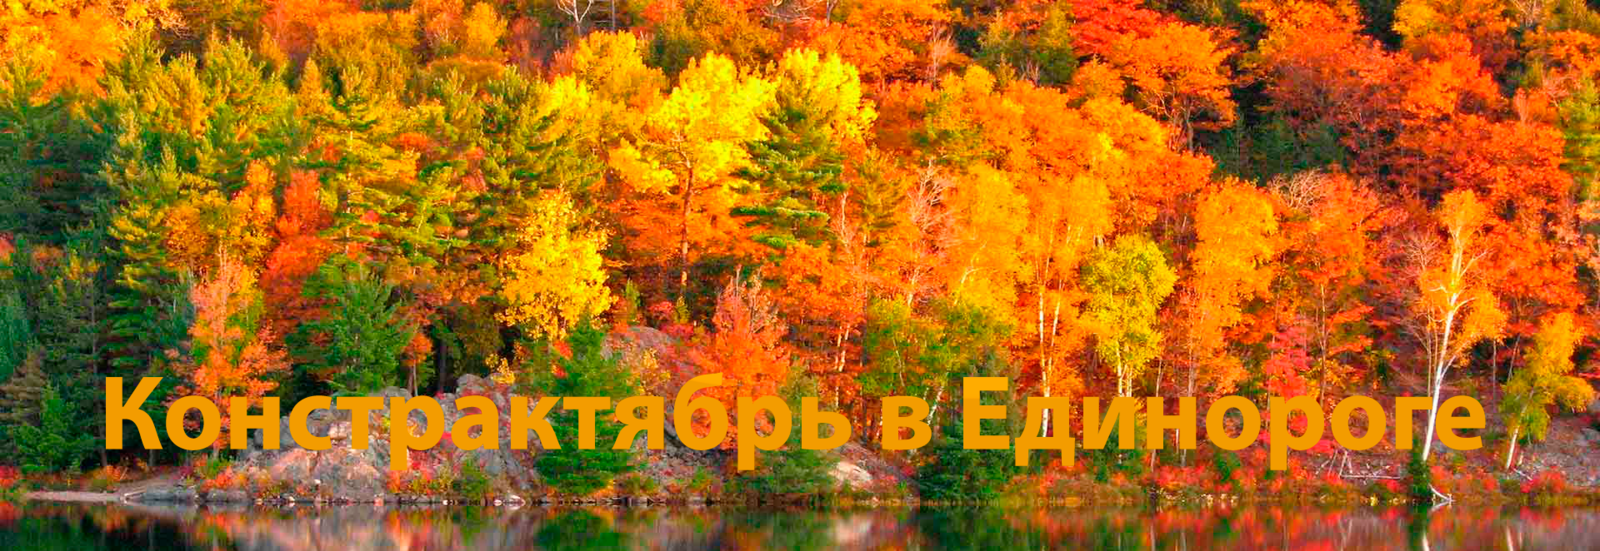 OctoberMorningТопдек.png